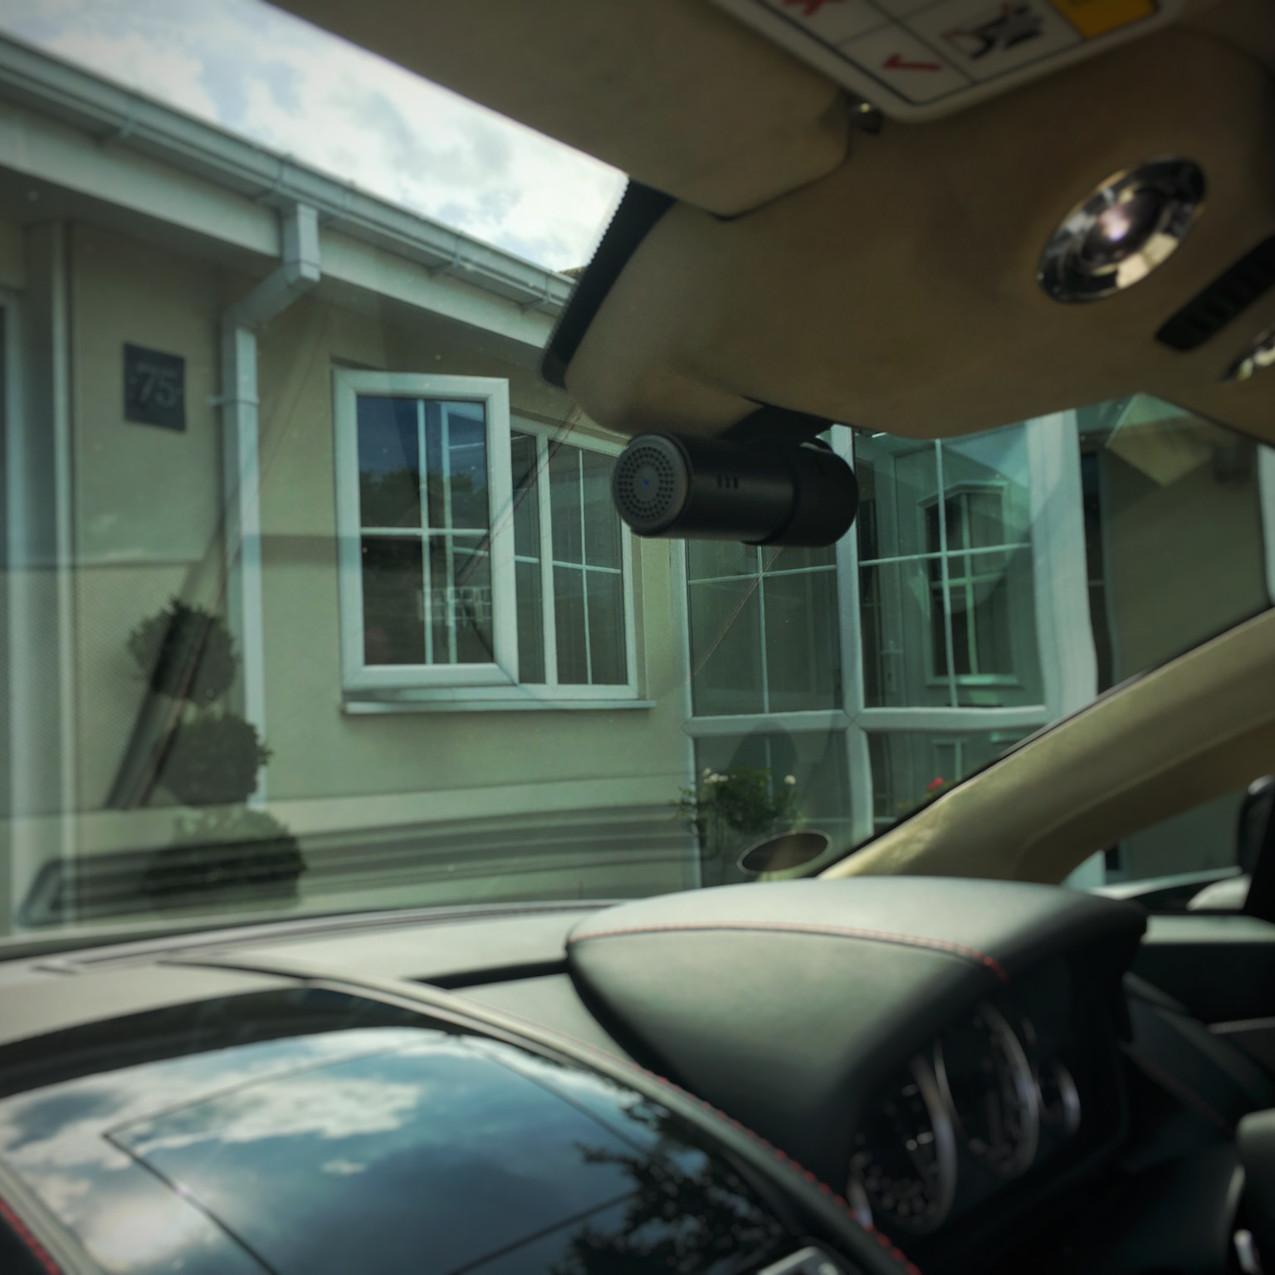 Aston Martin V8 Vantage Roadster Dashcam install Sheffield Yorkshire  Goluk Dashcam T1